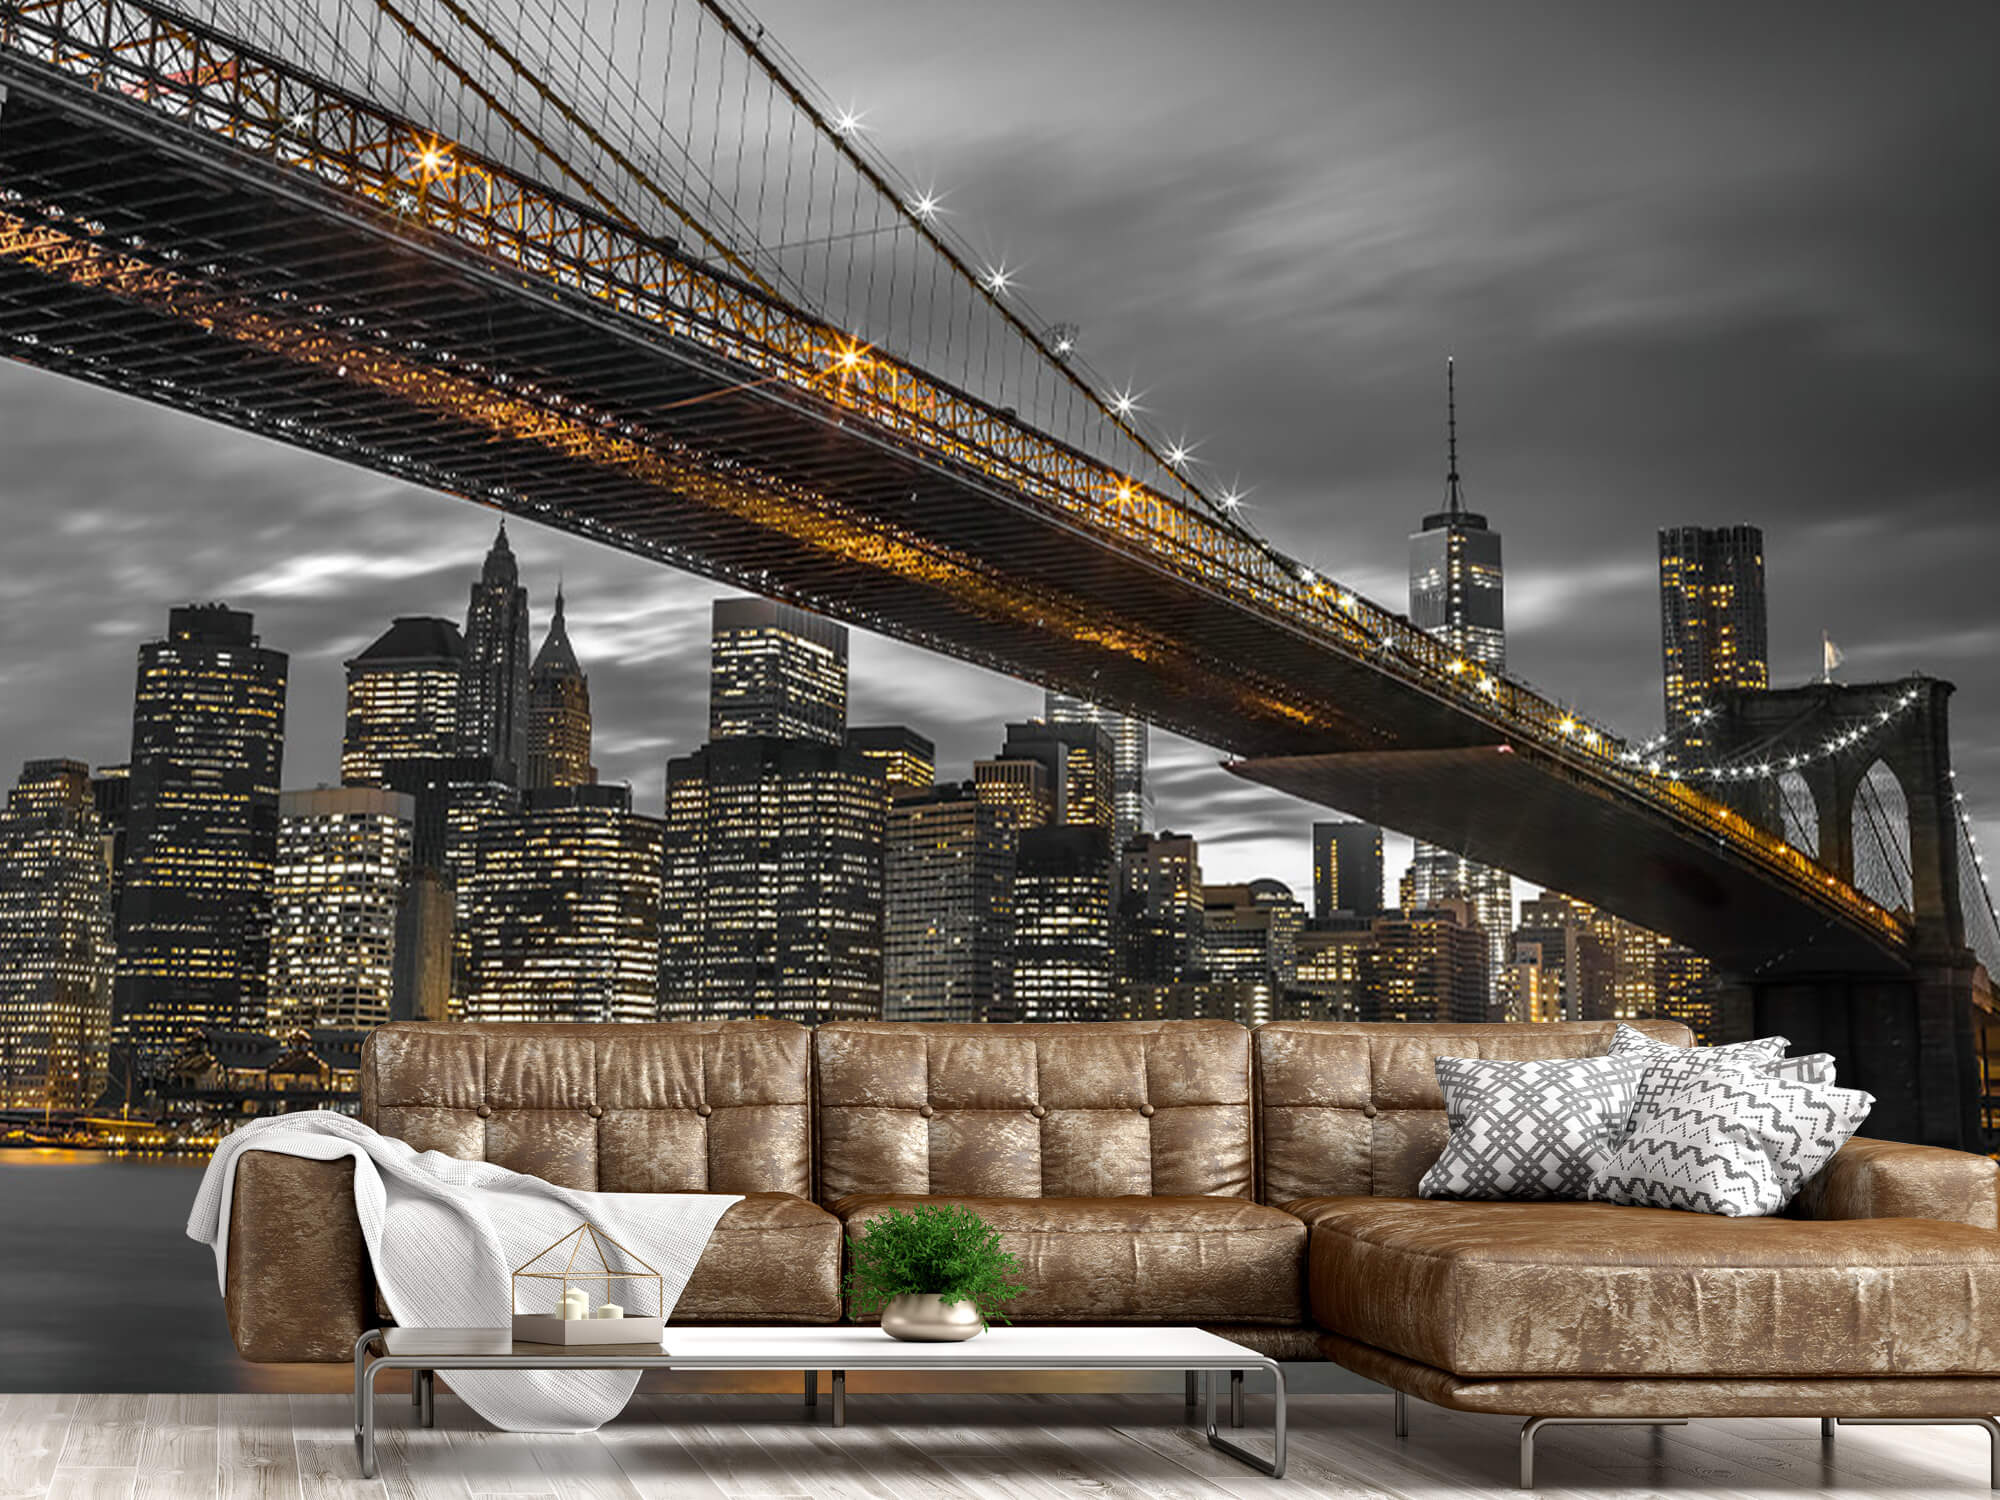 Brooklyn Bridge, New York 12